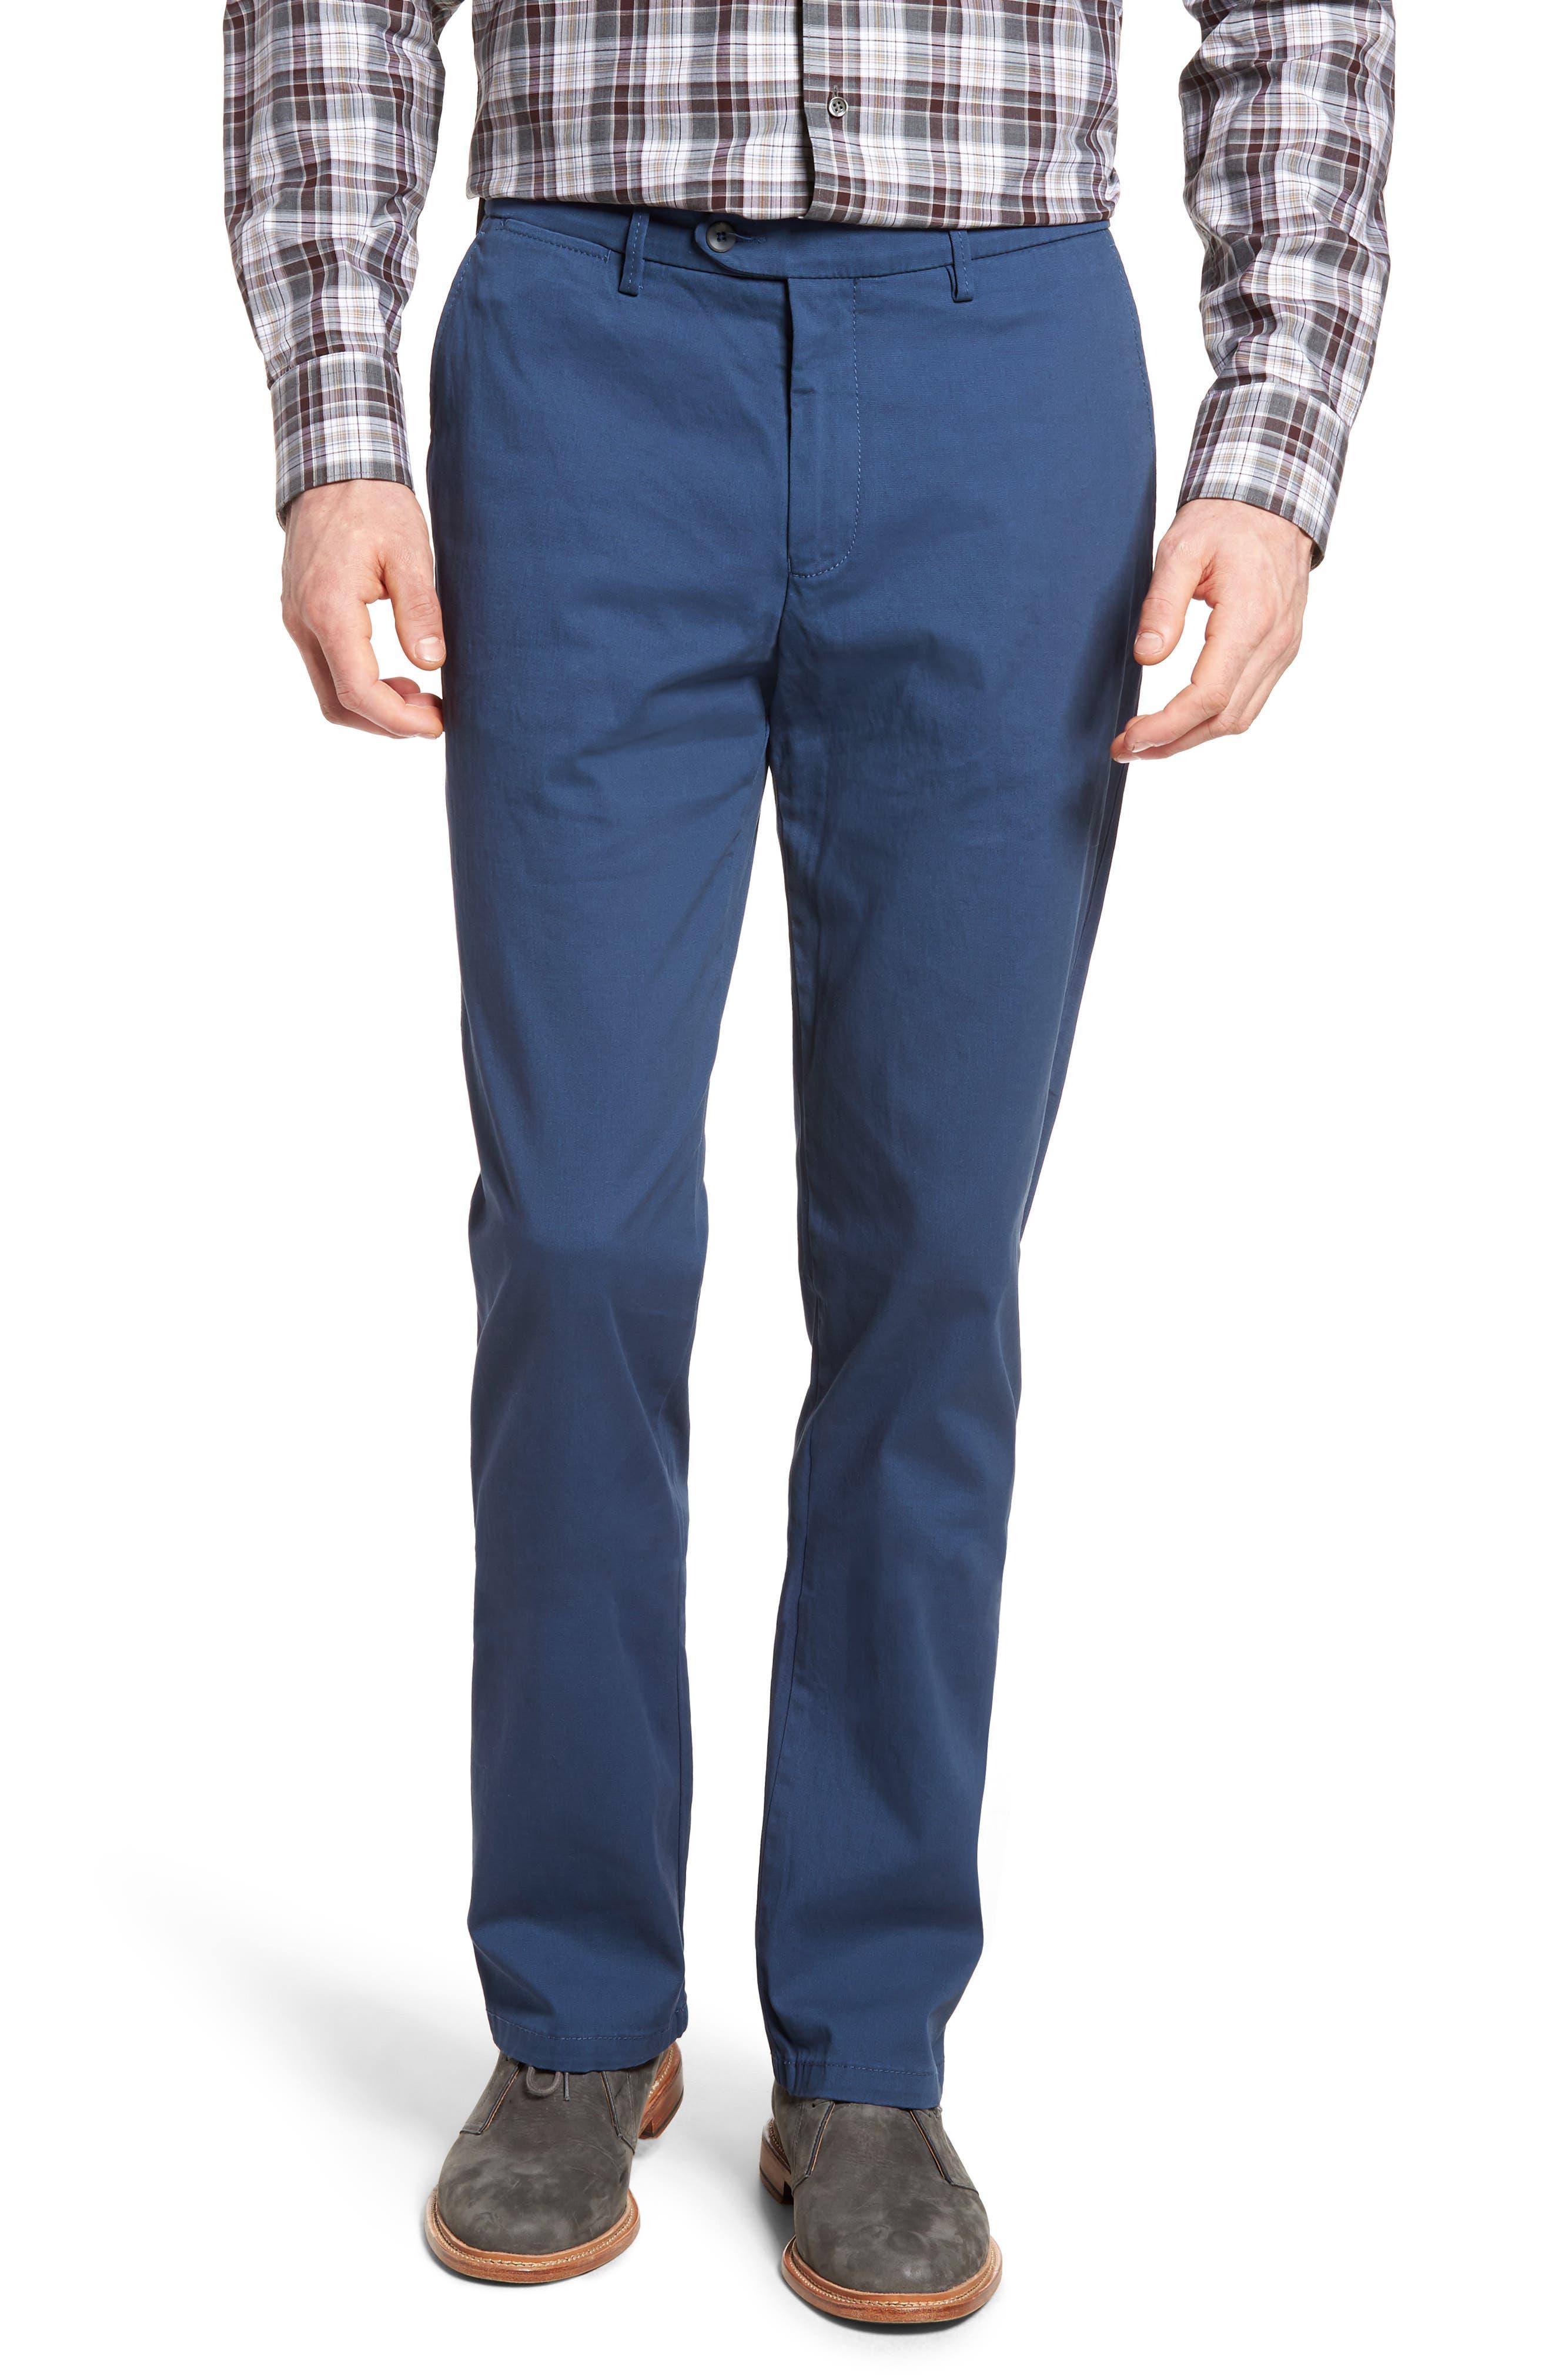 BALLIN Mansfield Pima Cotton Pant